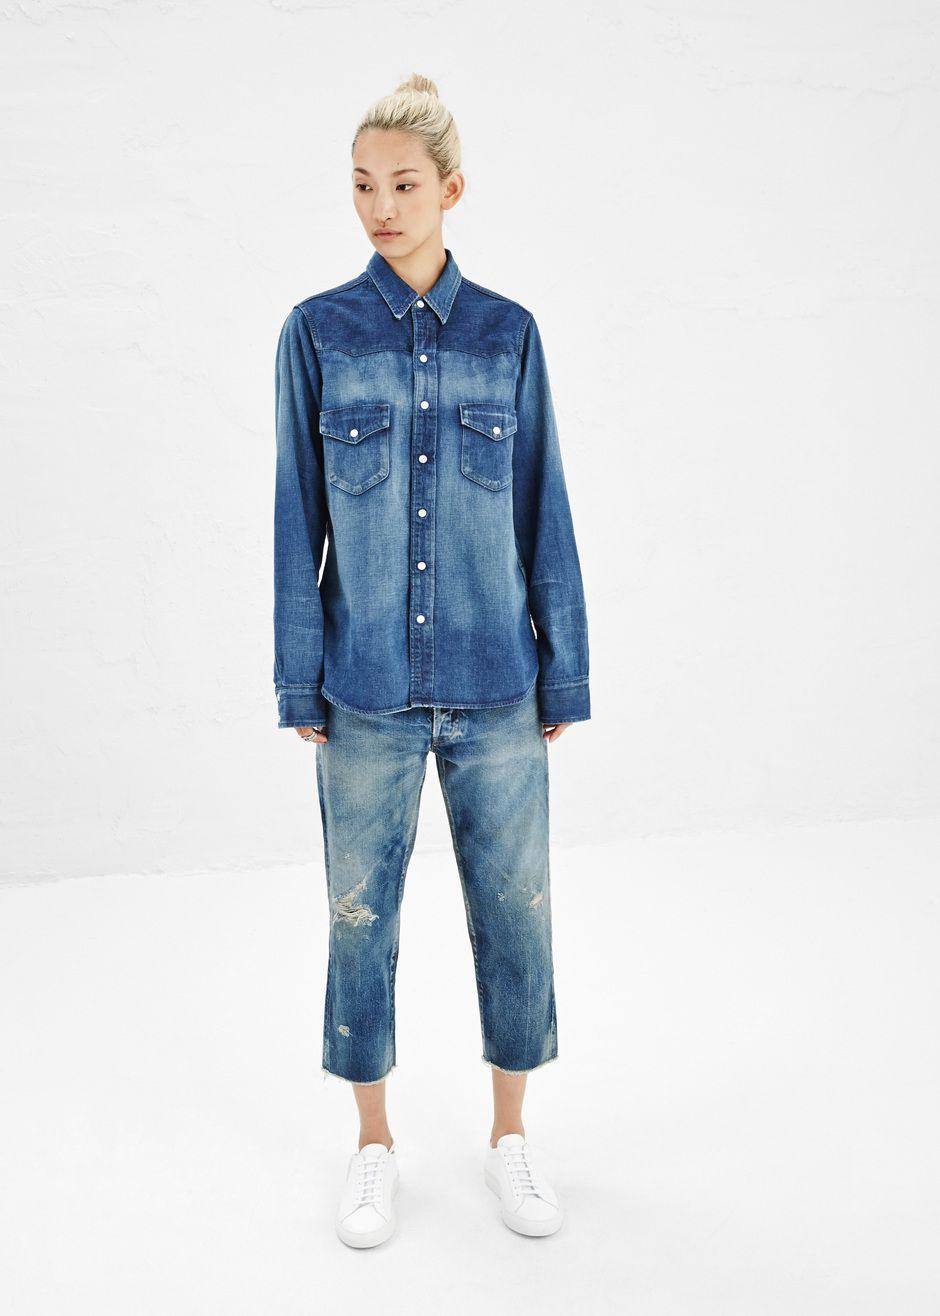 d64c221fad Totokaelo - Chimala Vintage Wash Denim Western Shirt -  432.00 ...